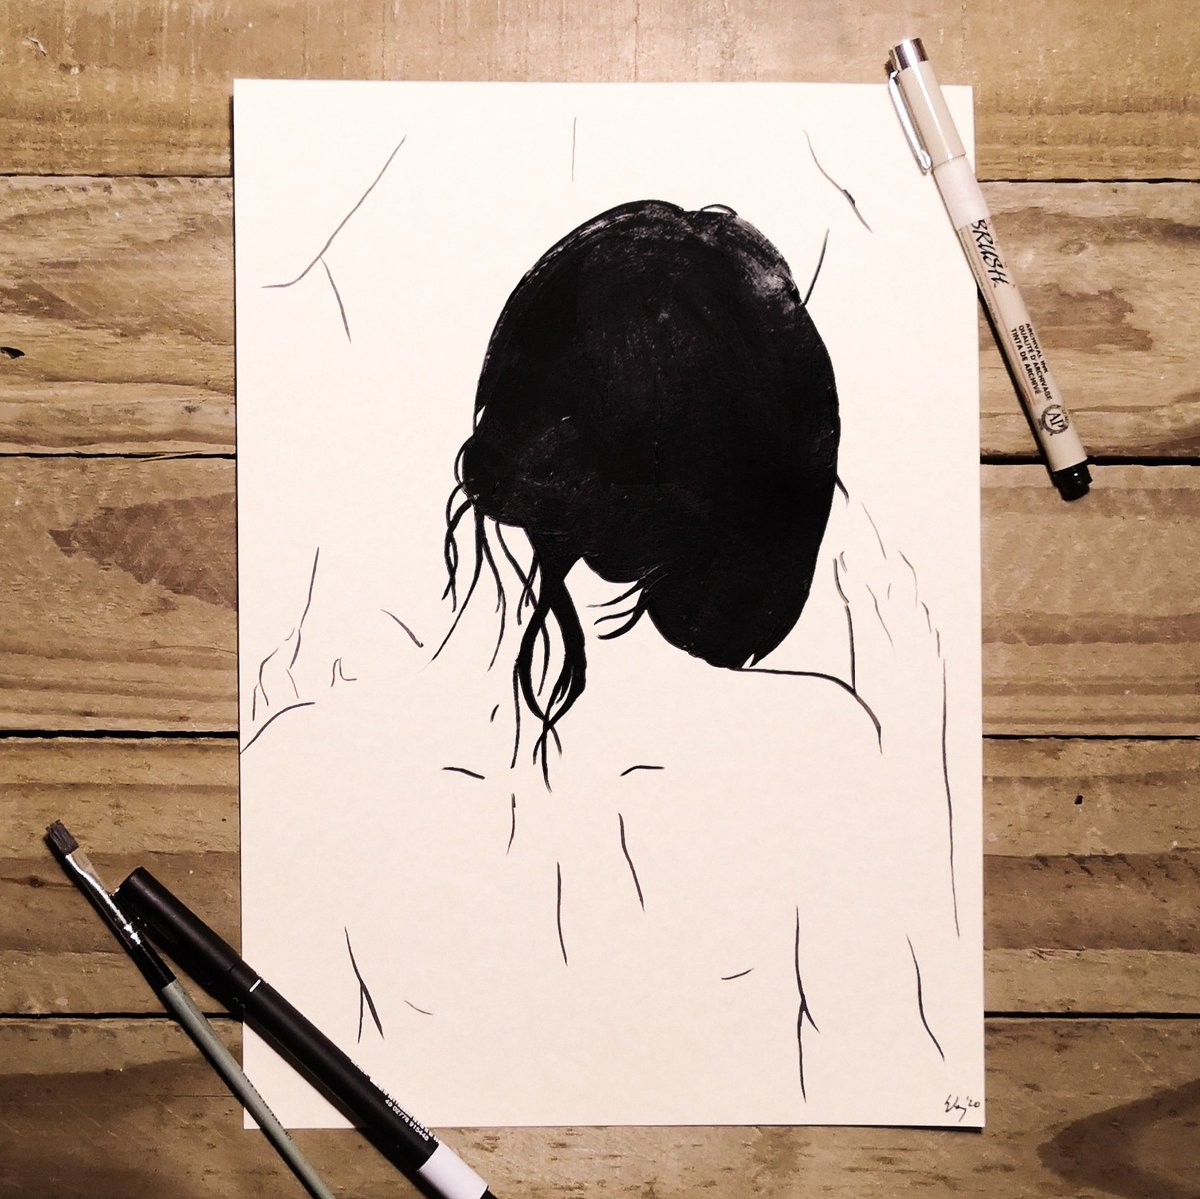 Talk To Me  #art #artwork #artist #illustrator #drawing #illustrating #minimaldrawing #minimaliststyle #lineart #art #artwork #twitterart #illustration #simplicity #moderndrawing #linedrawing #durbanart #artistsoftwitter #artistsontwitter #durbanartistpic.twitter.com/dV3R2lVT1U